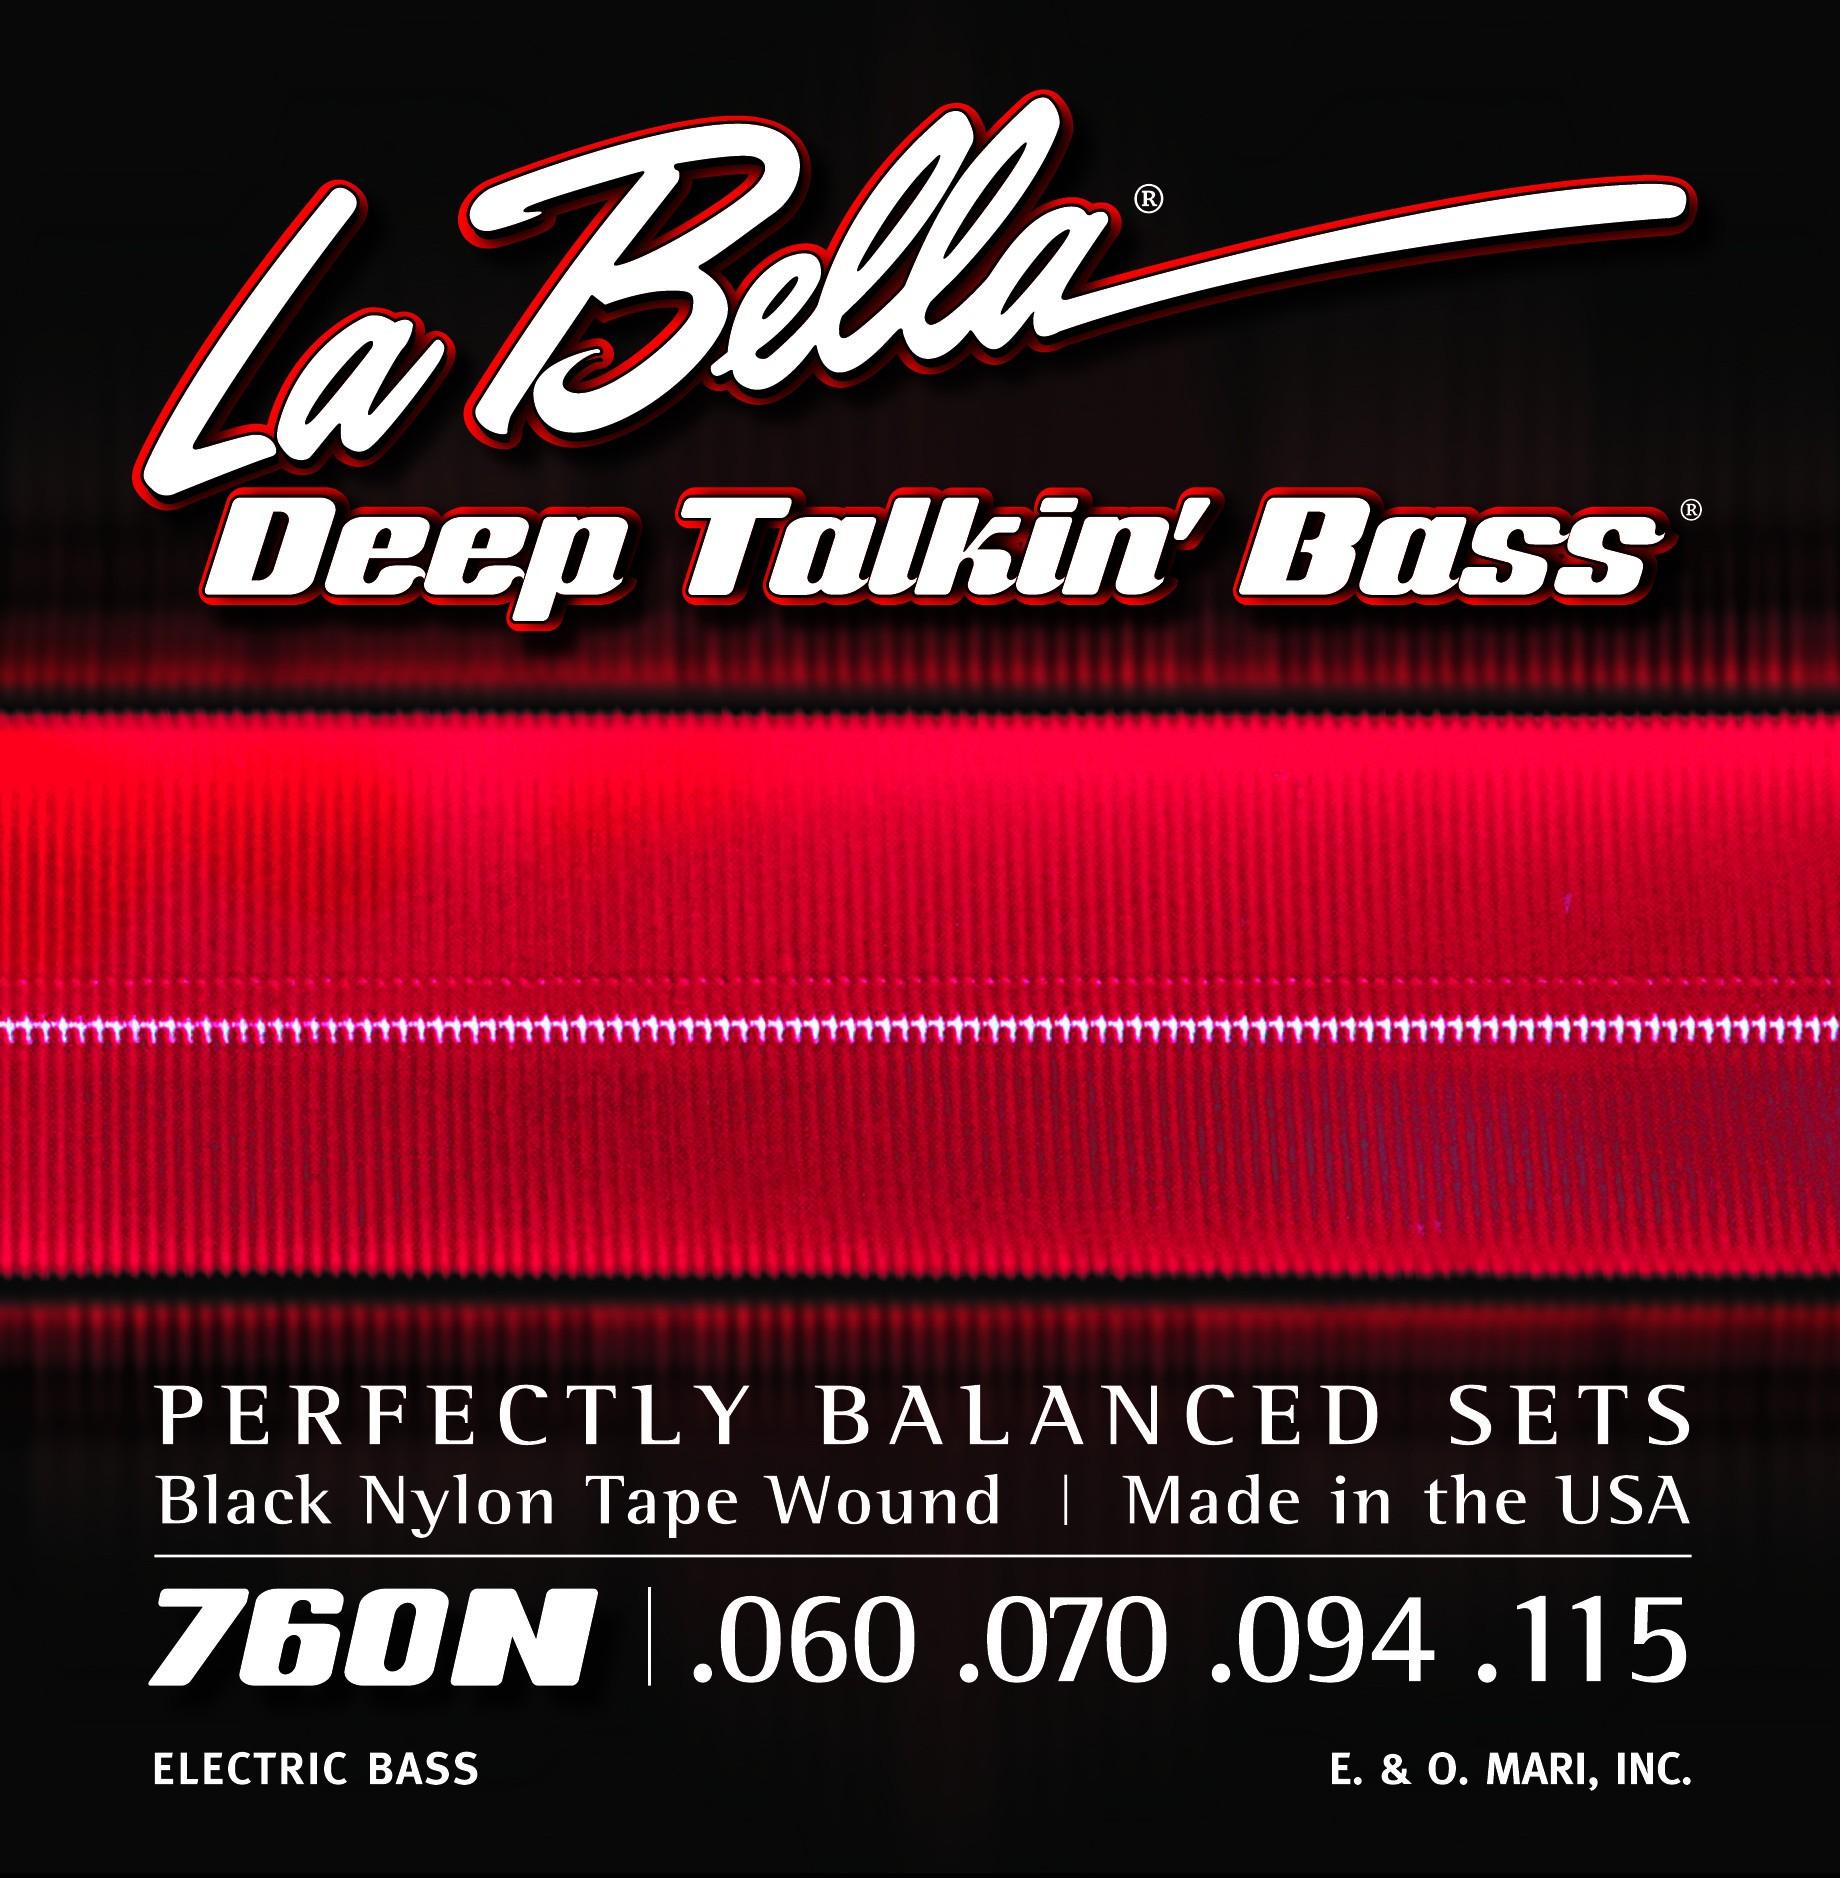 La Bella Bass Guitar Strings - Nylon Tape Wound